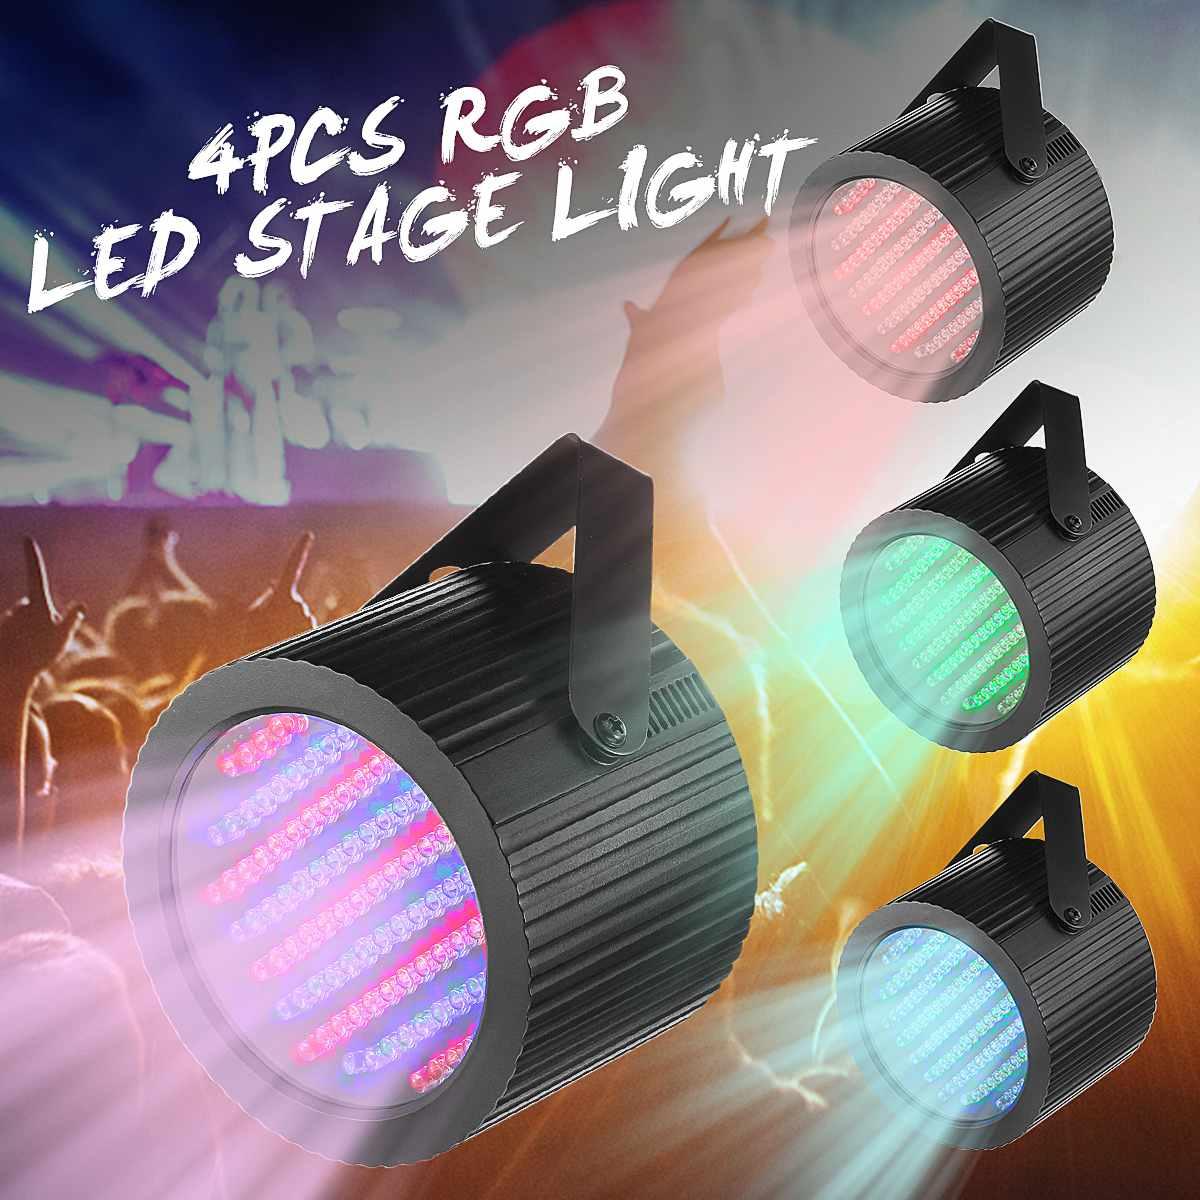 2 Pcs 86 RGB 25W 7 Channels LED Stage Light DMX Laser Projector LED Lamp DJ Disco Club Bar Party Stage Effect Lighting Lights